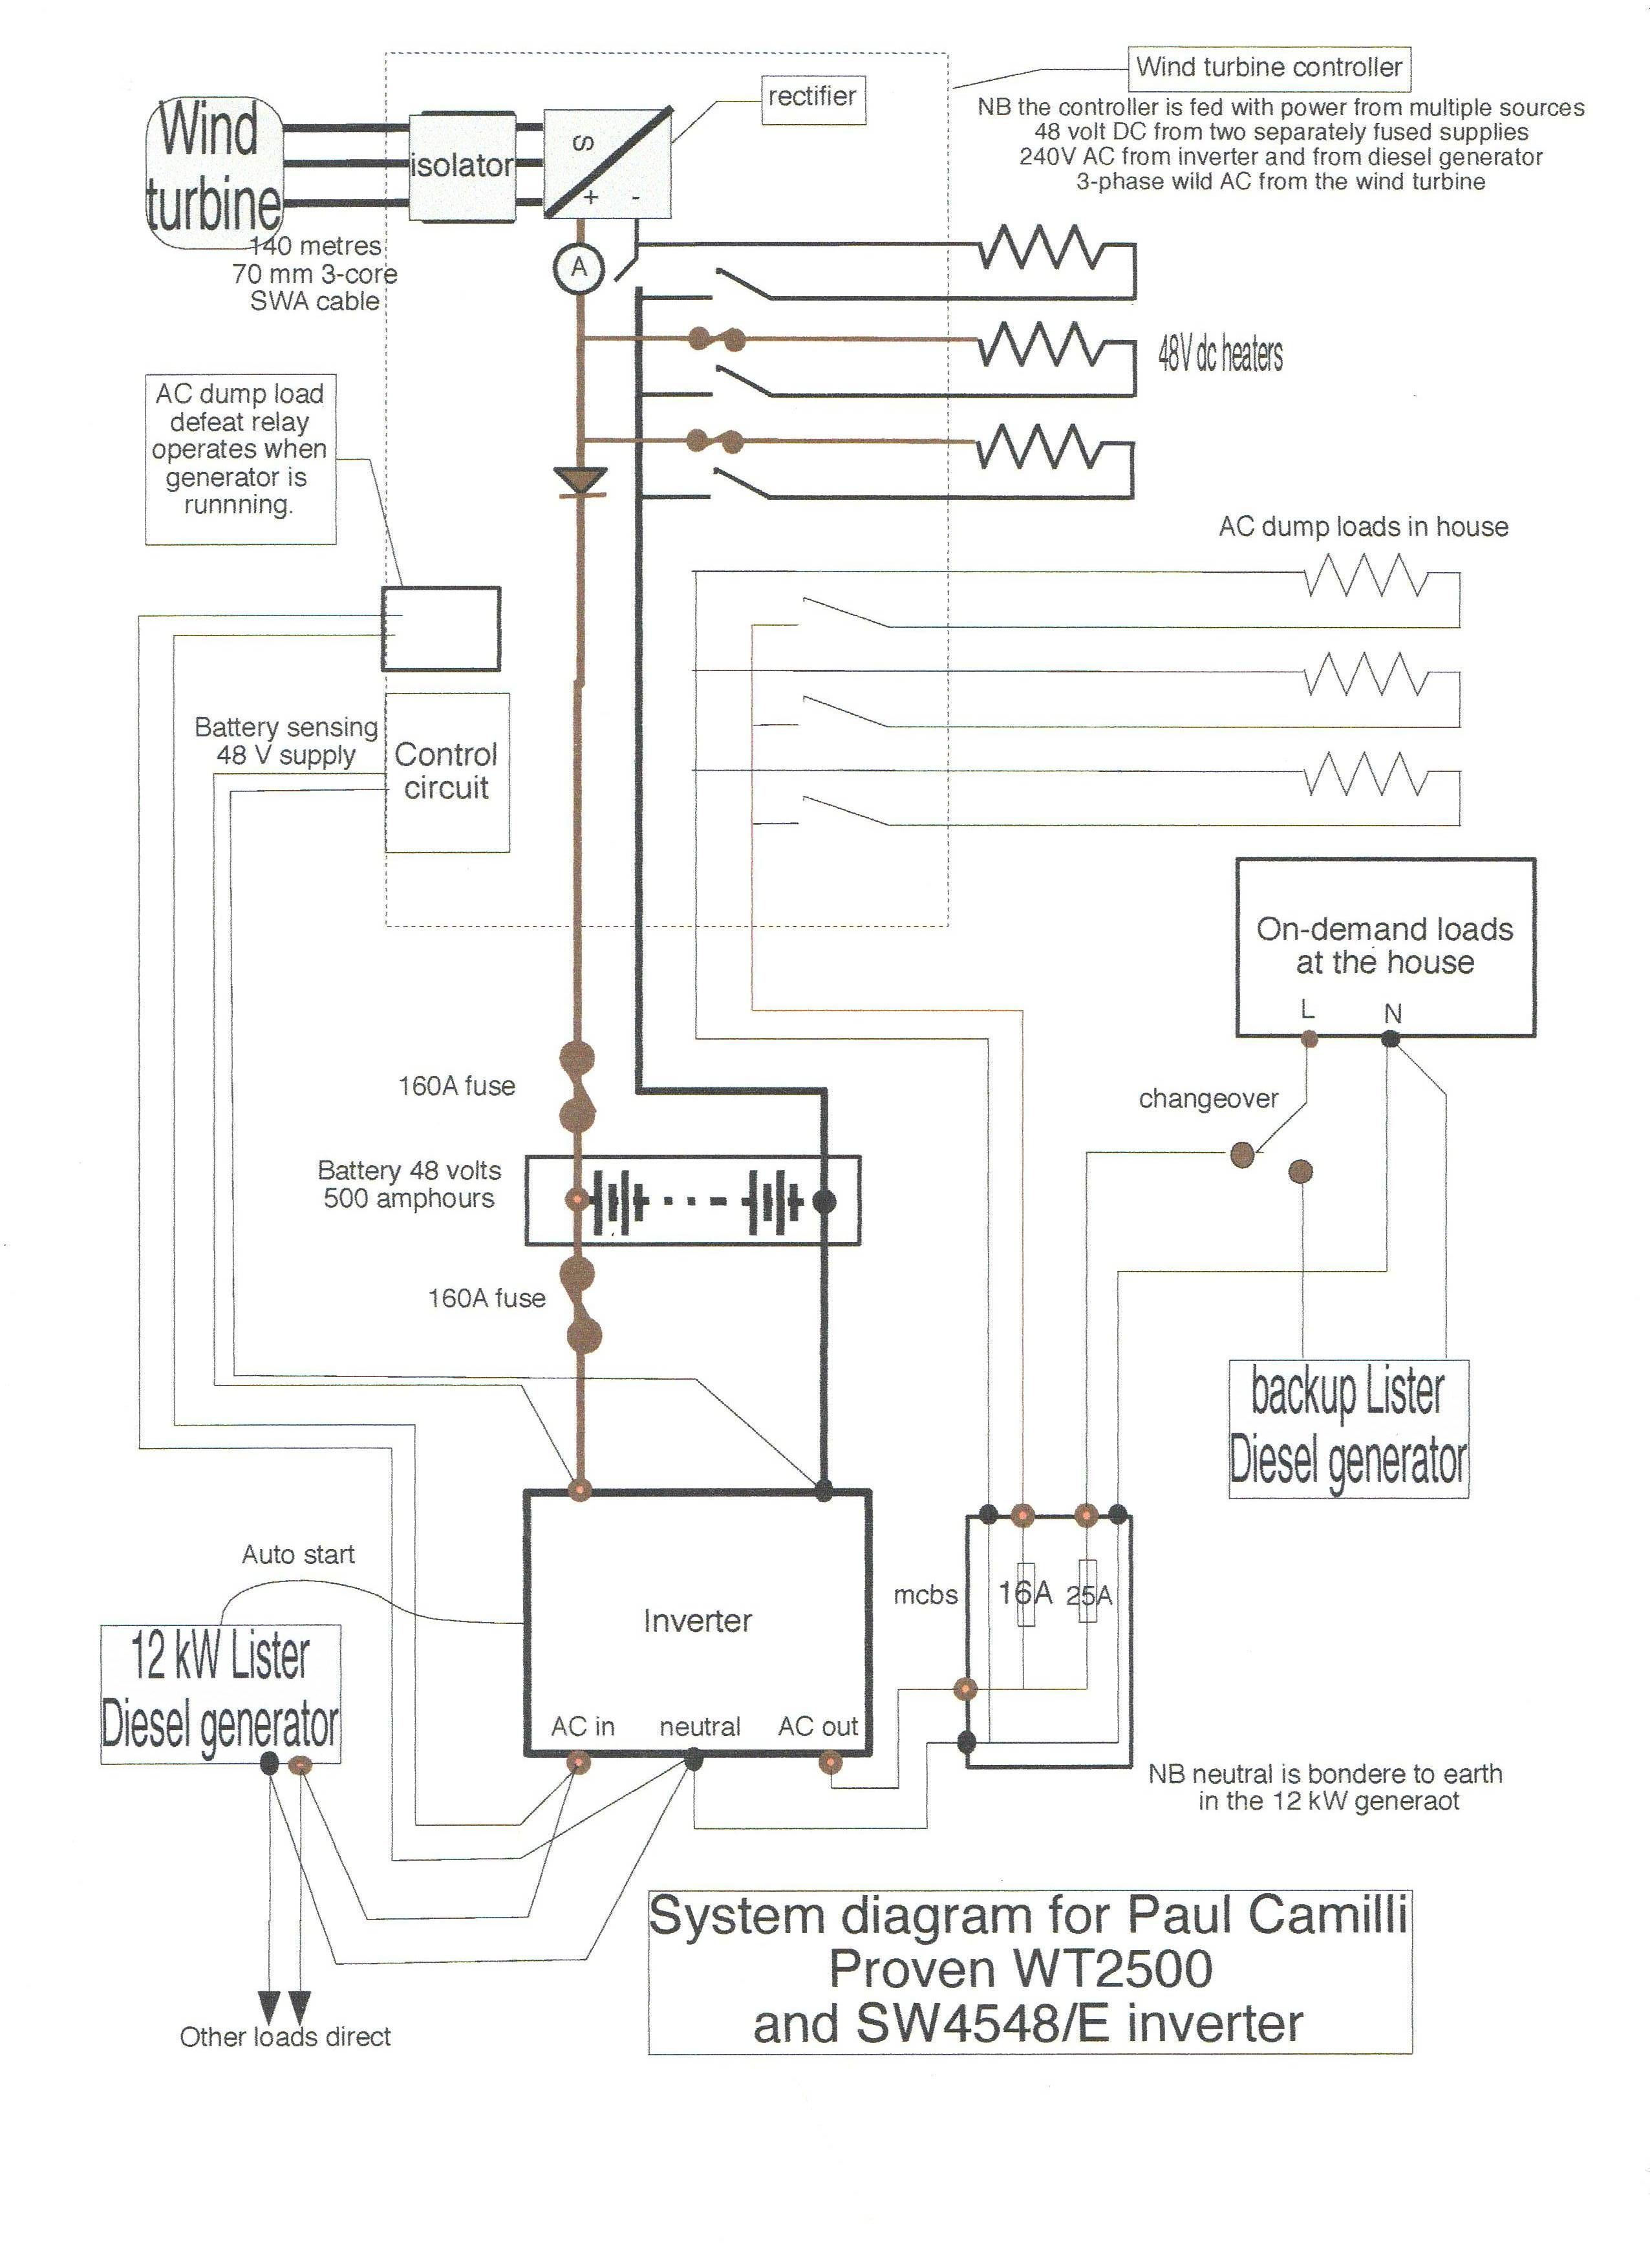 Wind turbine wiring diagram Wind turbine, Wind power